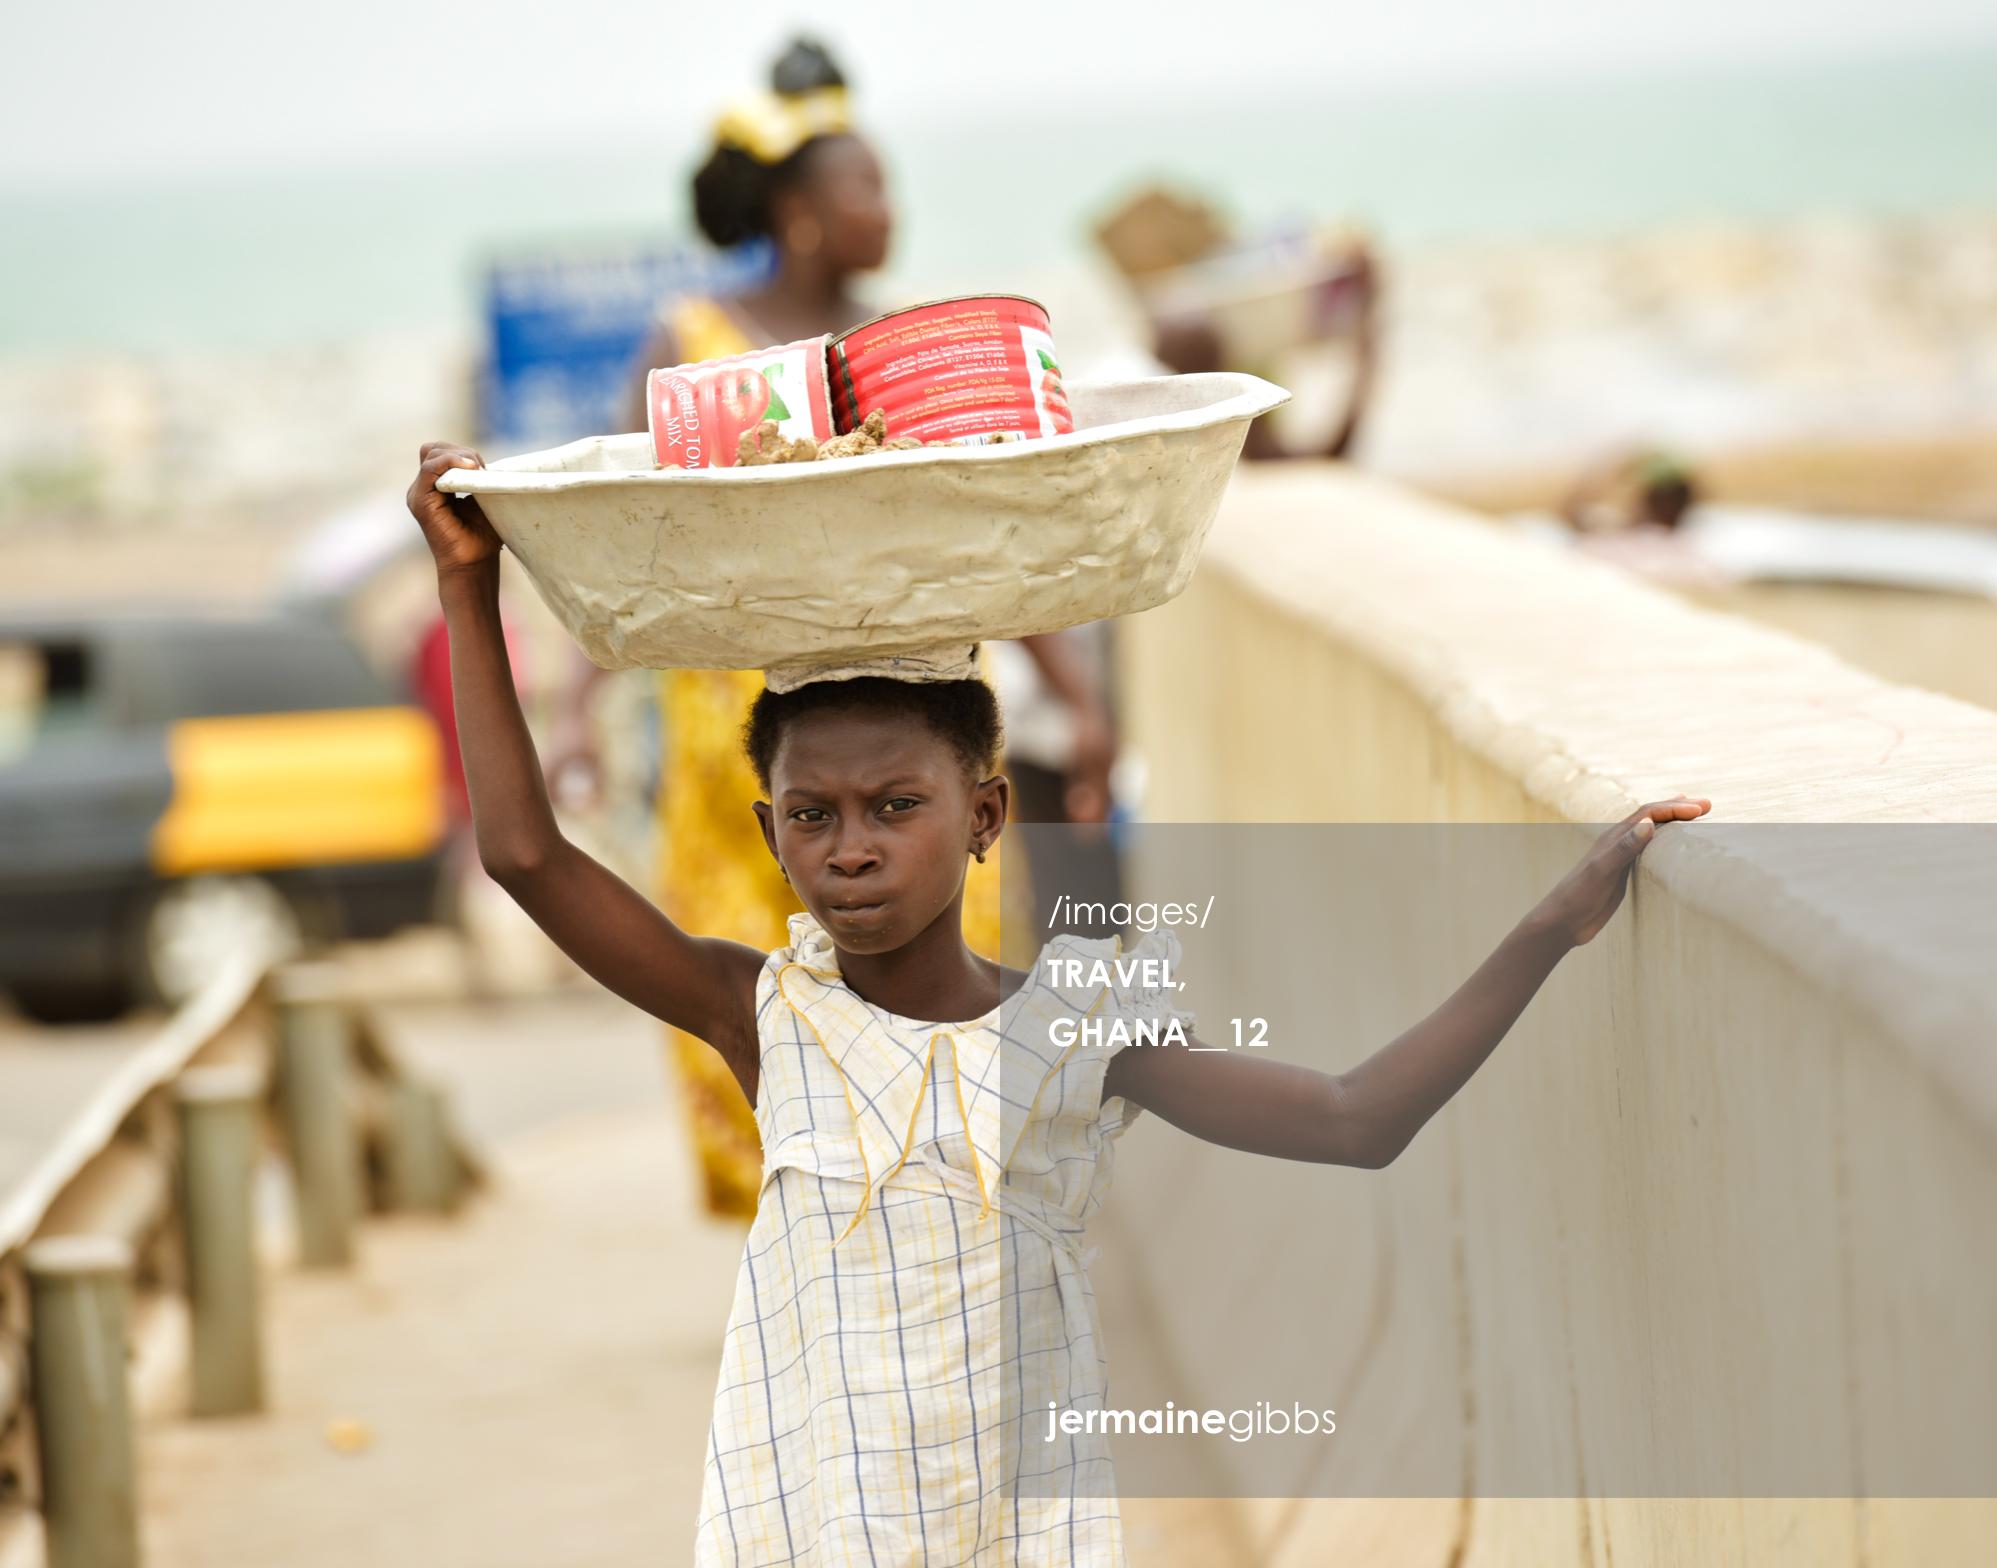 Travel_Ghana__12